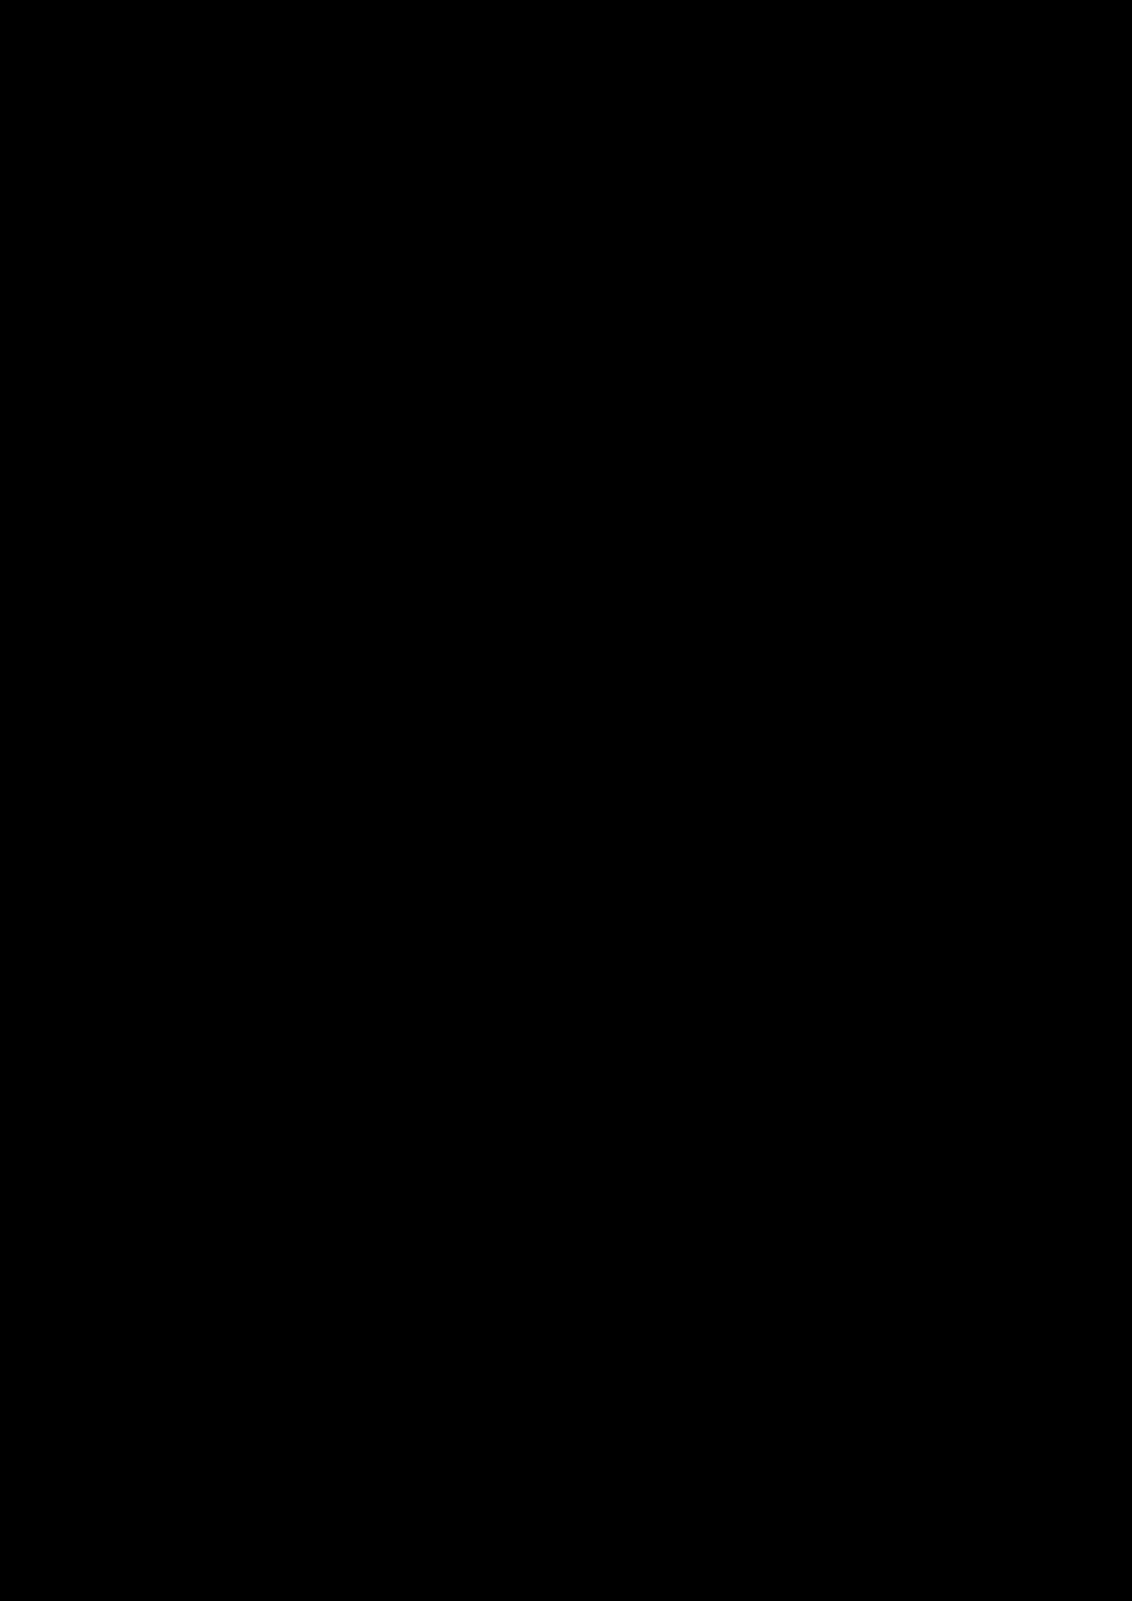 Belyiy sokol slide, Image 159